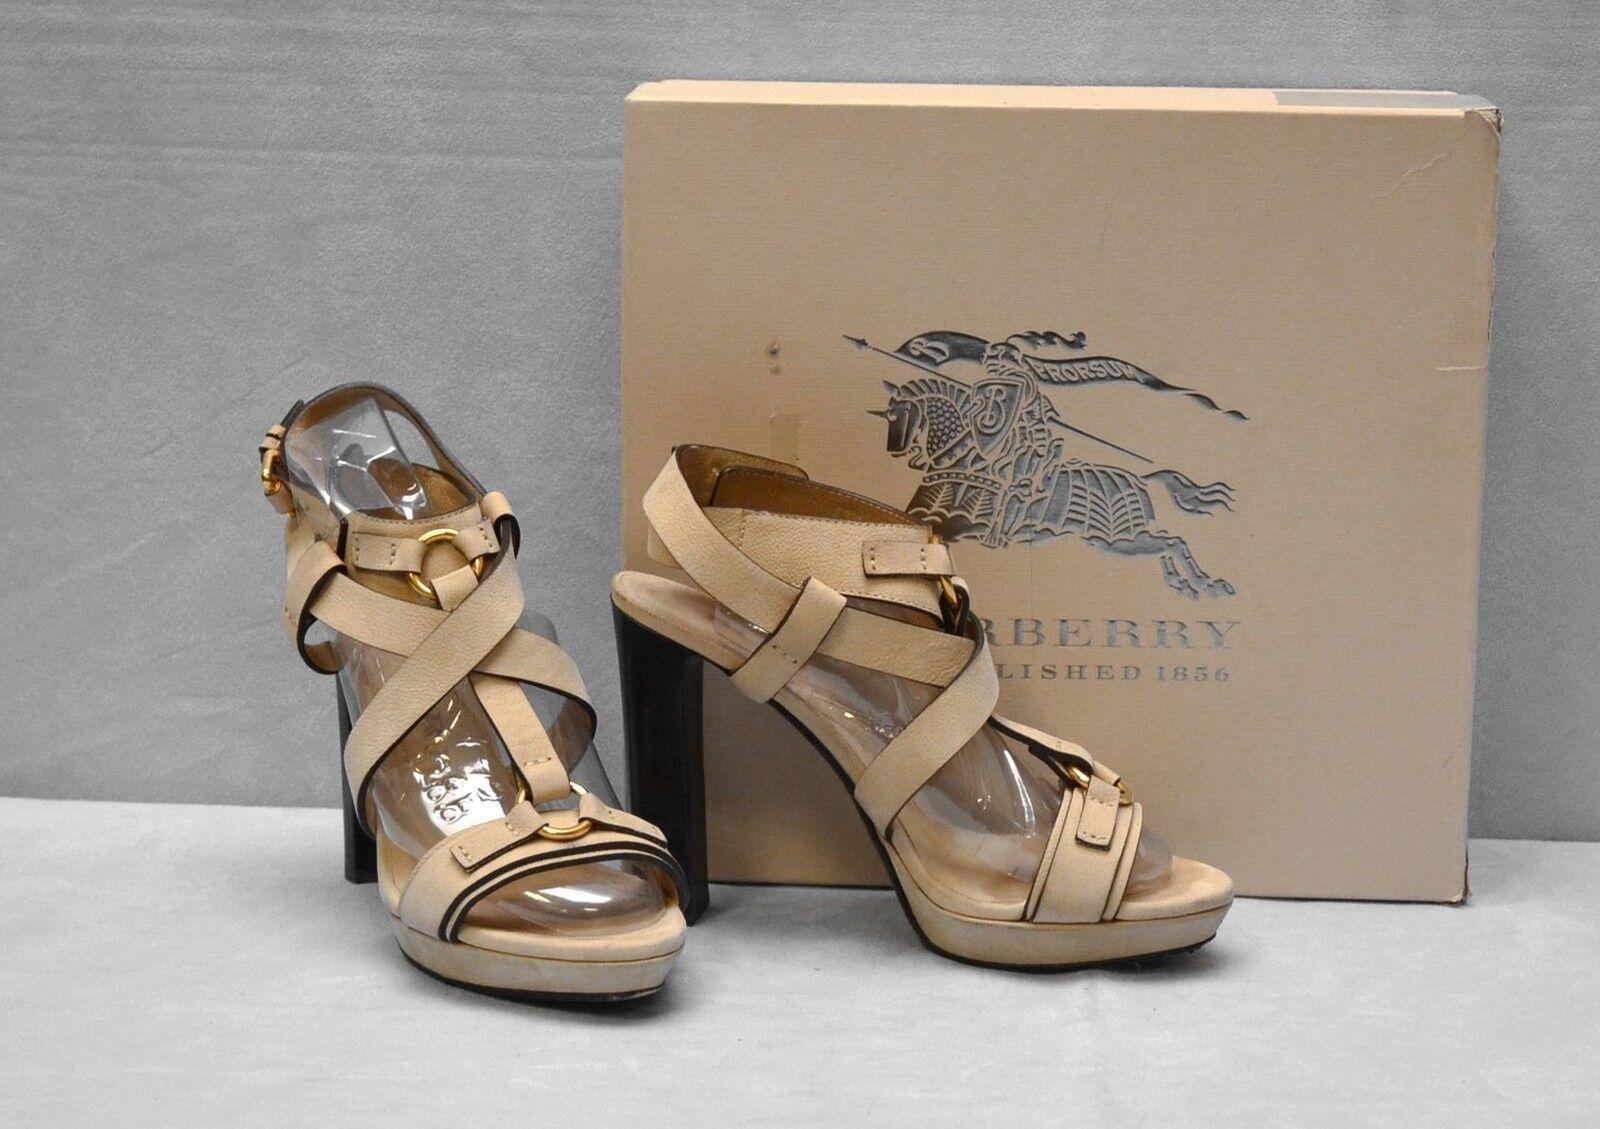 F0 Auth BURBERRY Soft Aviator Dessen Platform Sandal Heels Shoes Sz 39 5